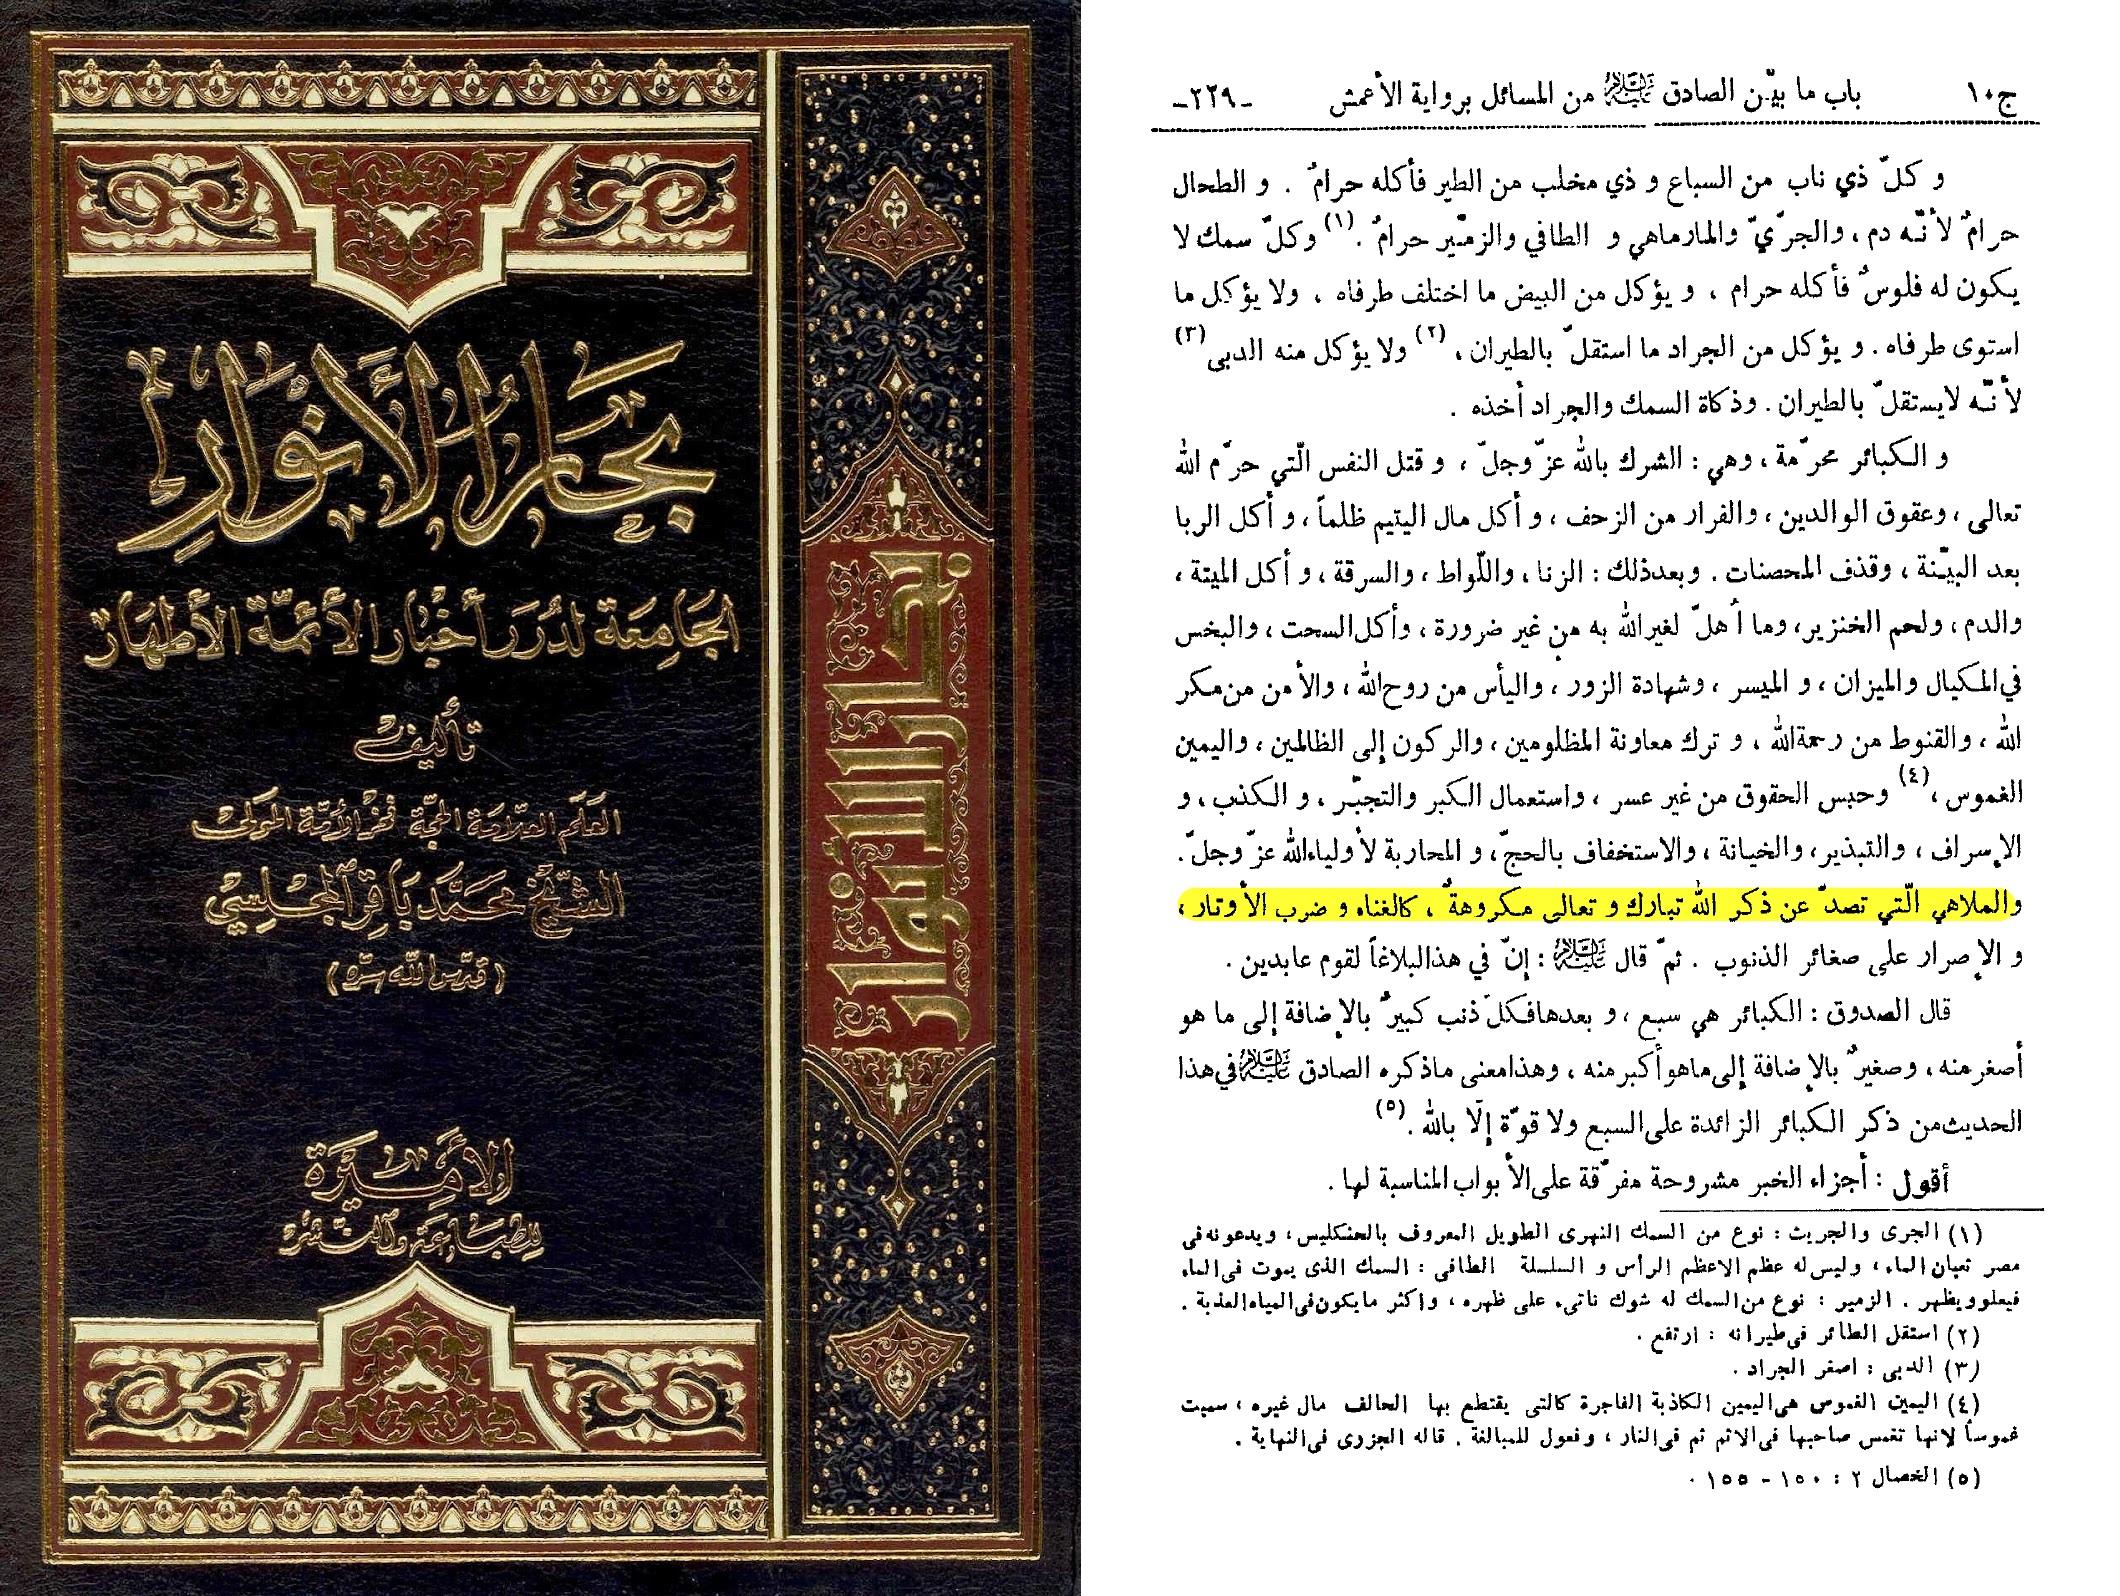 be7ar-anwar-band-10-seite-229-hadith-1